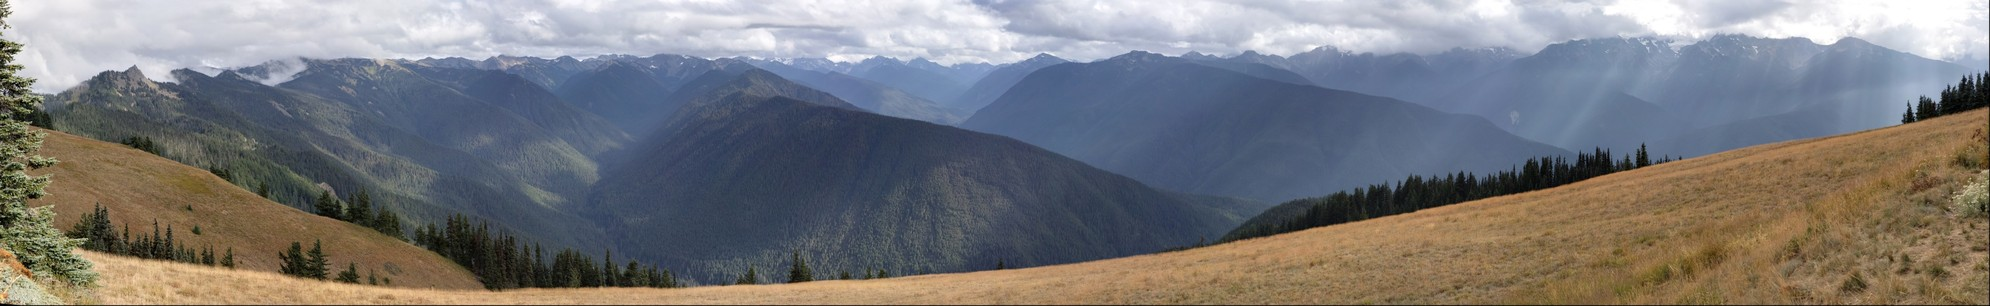 Hurrican Ridge and Mount Olympus